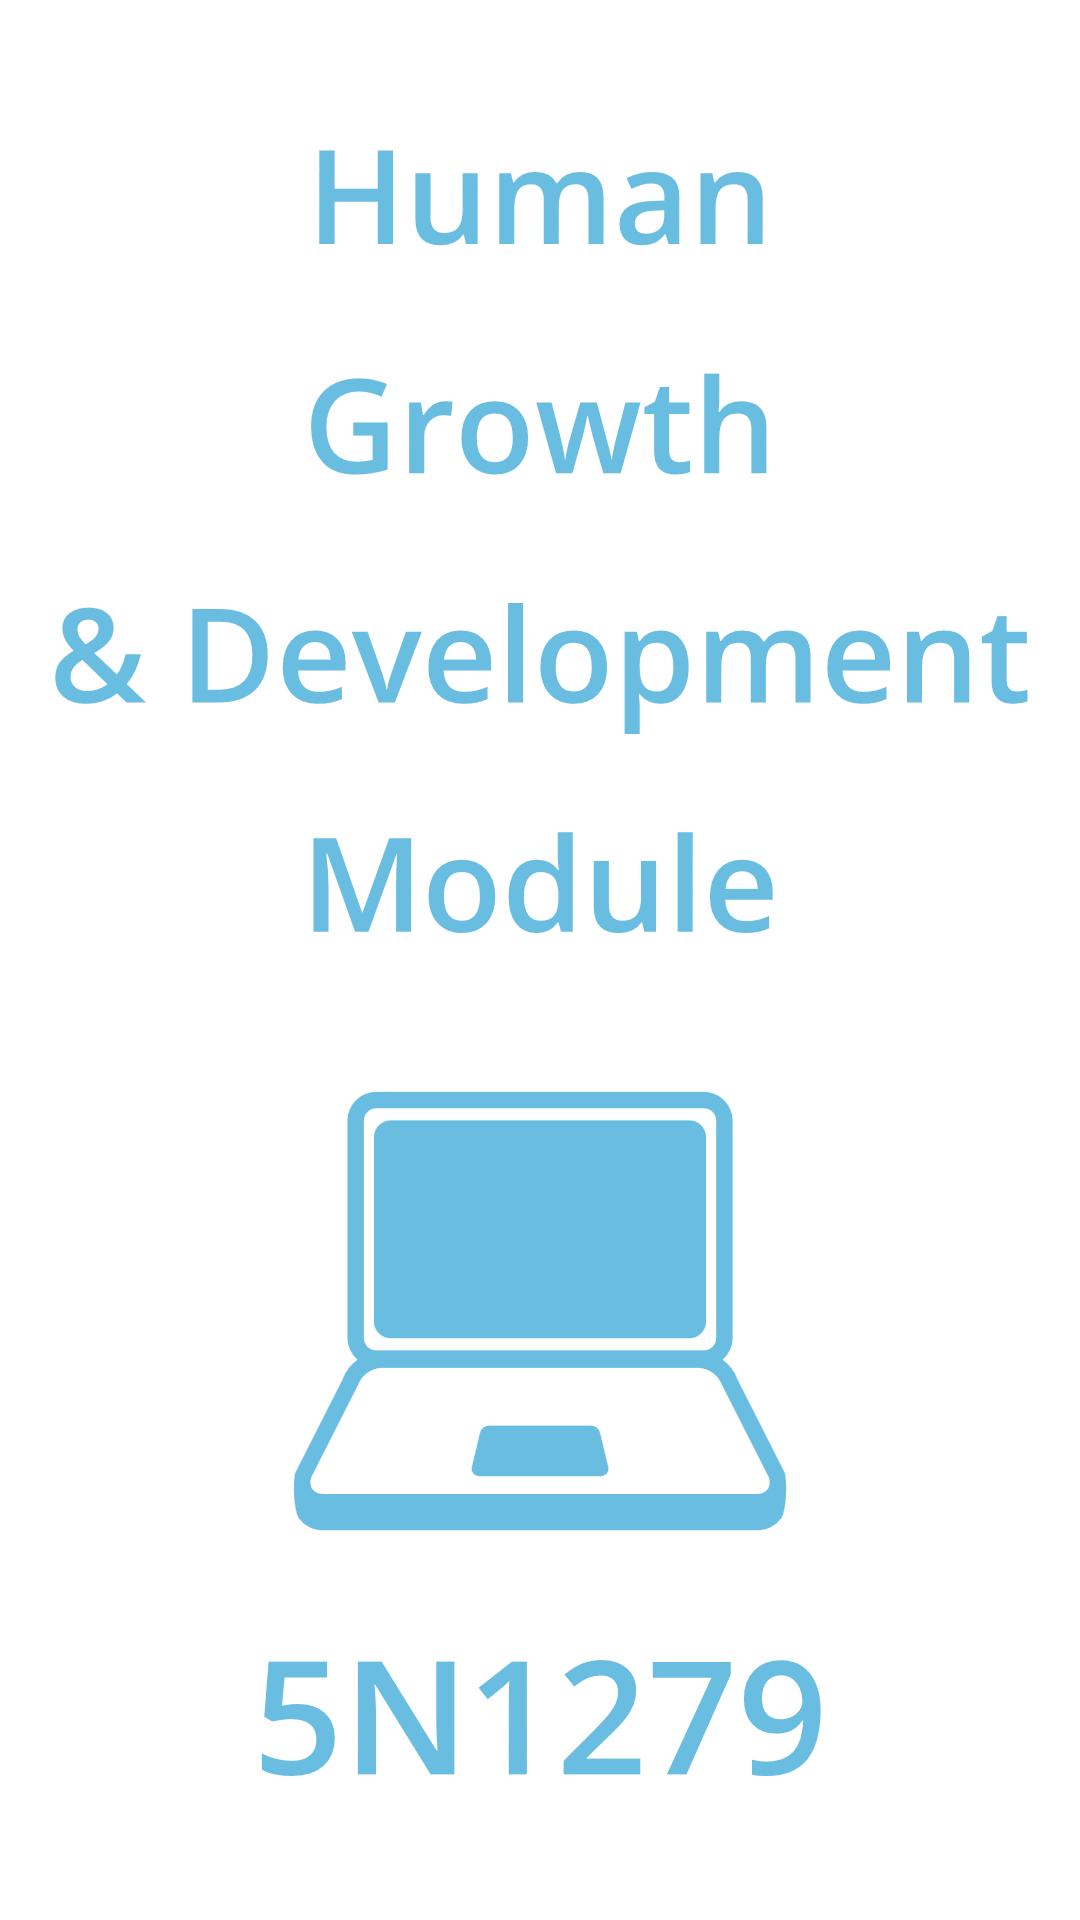 human growth & development course